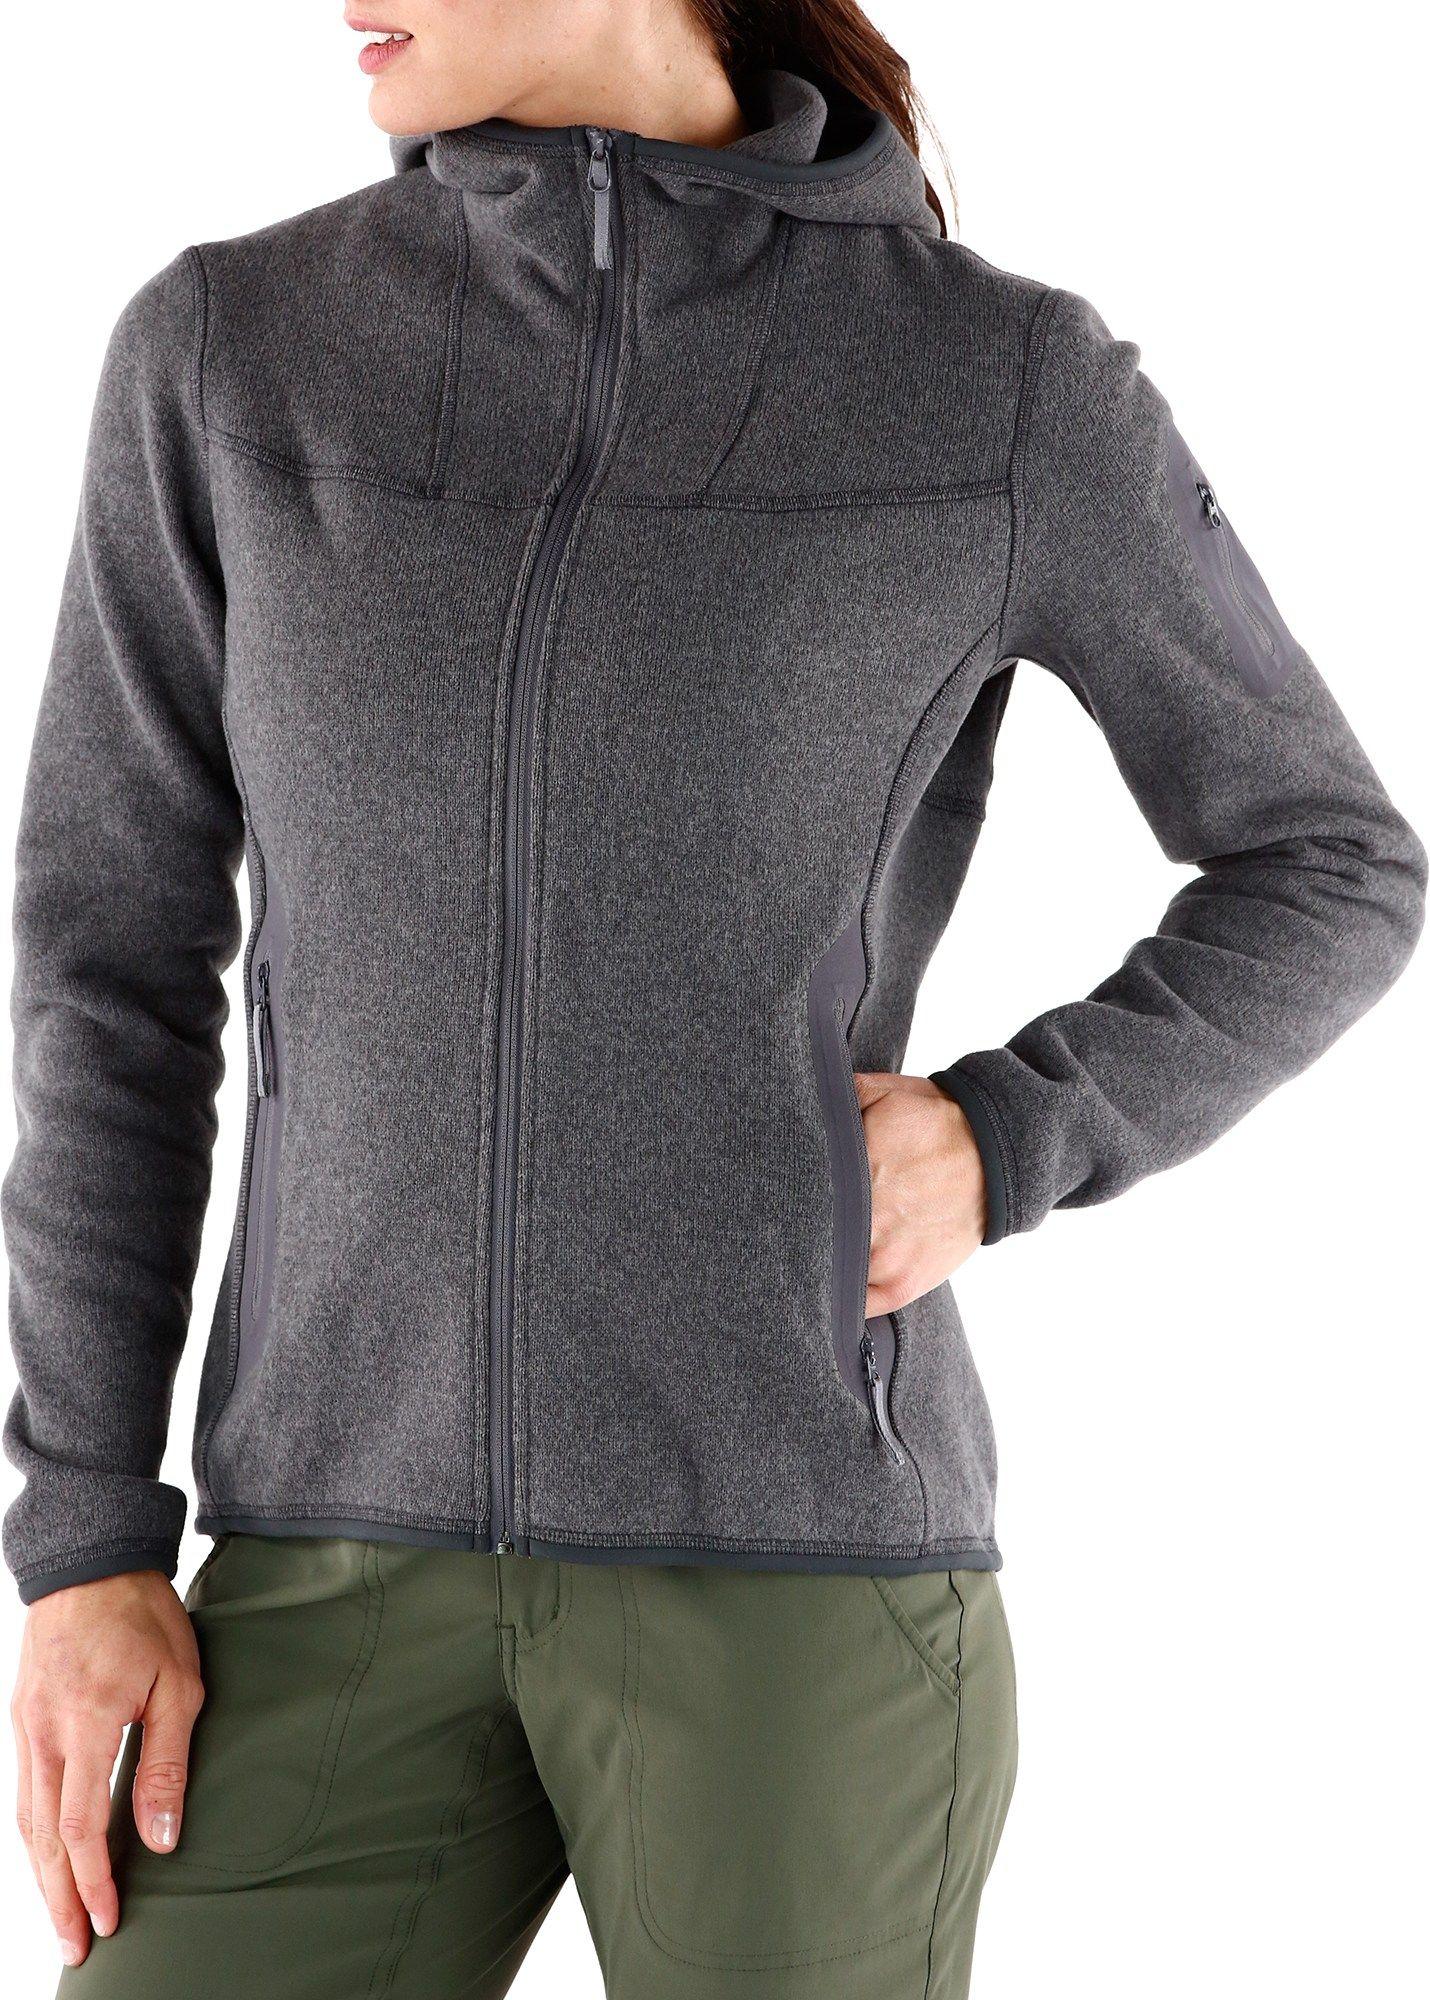 6003aeb9548 Arc'teryx Female Covert Hoodie Fleece Jacket - Women's | *Apparel ...